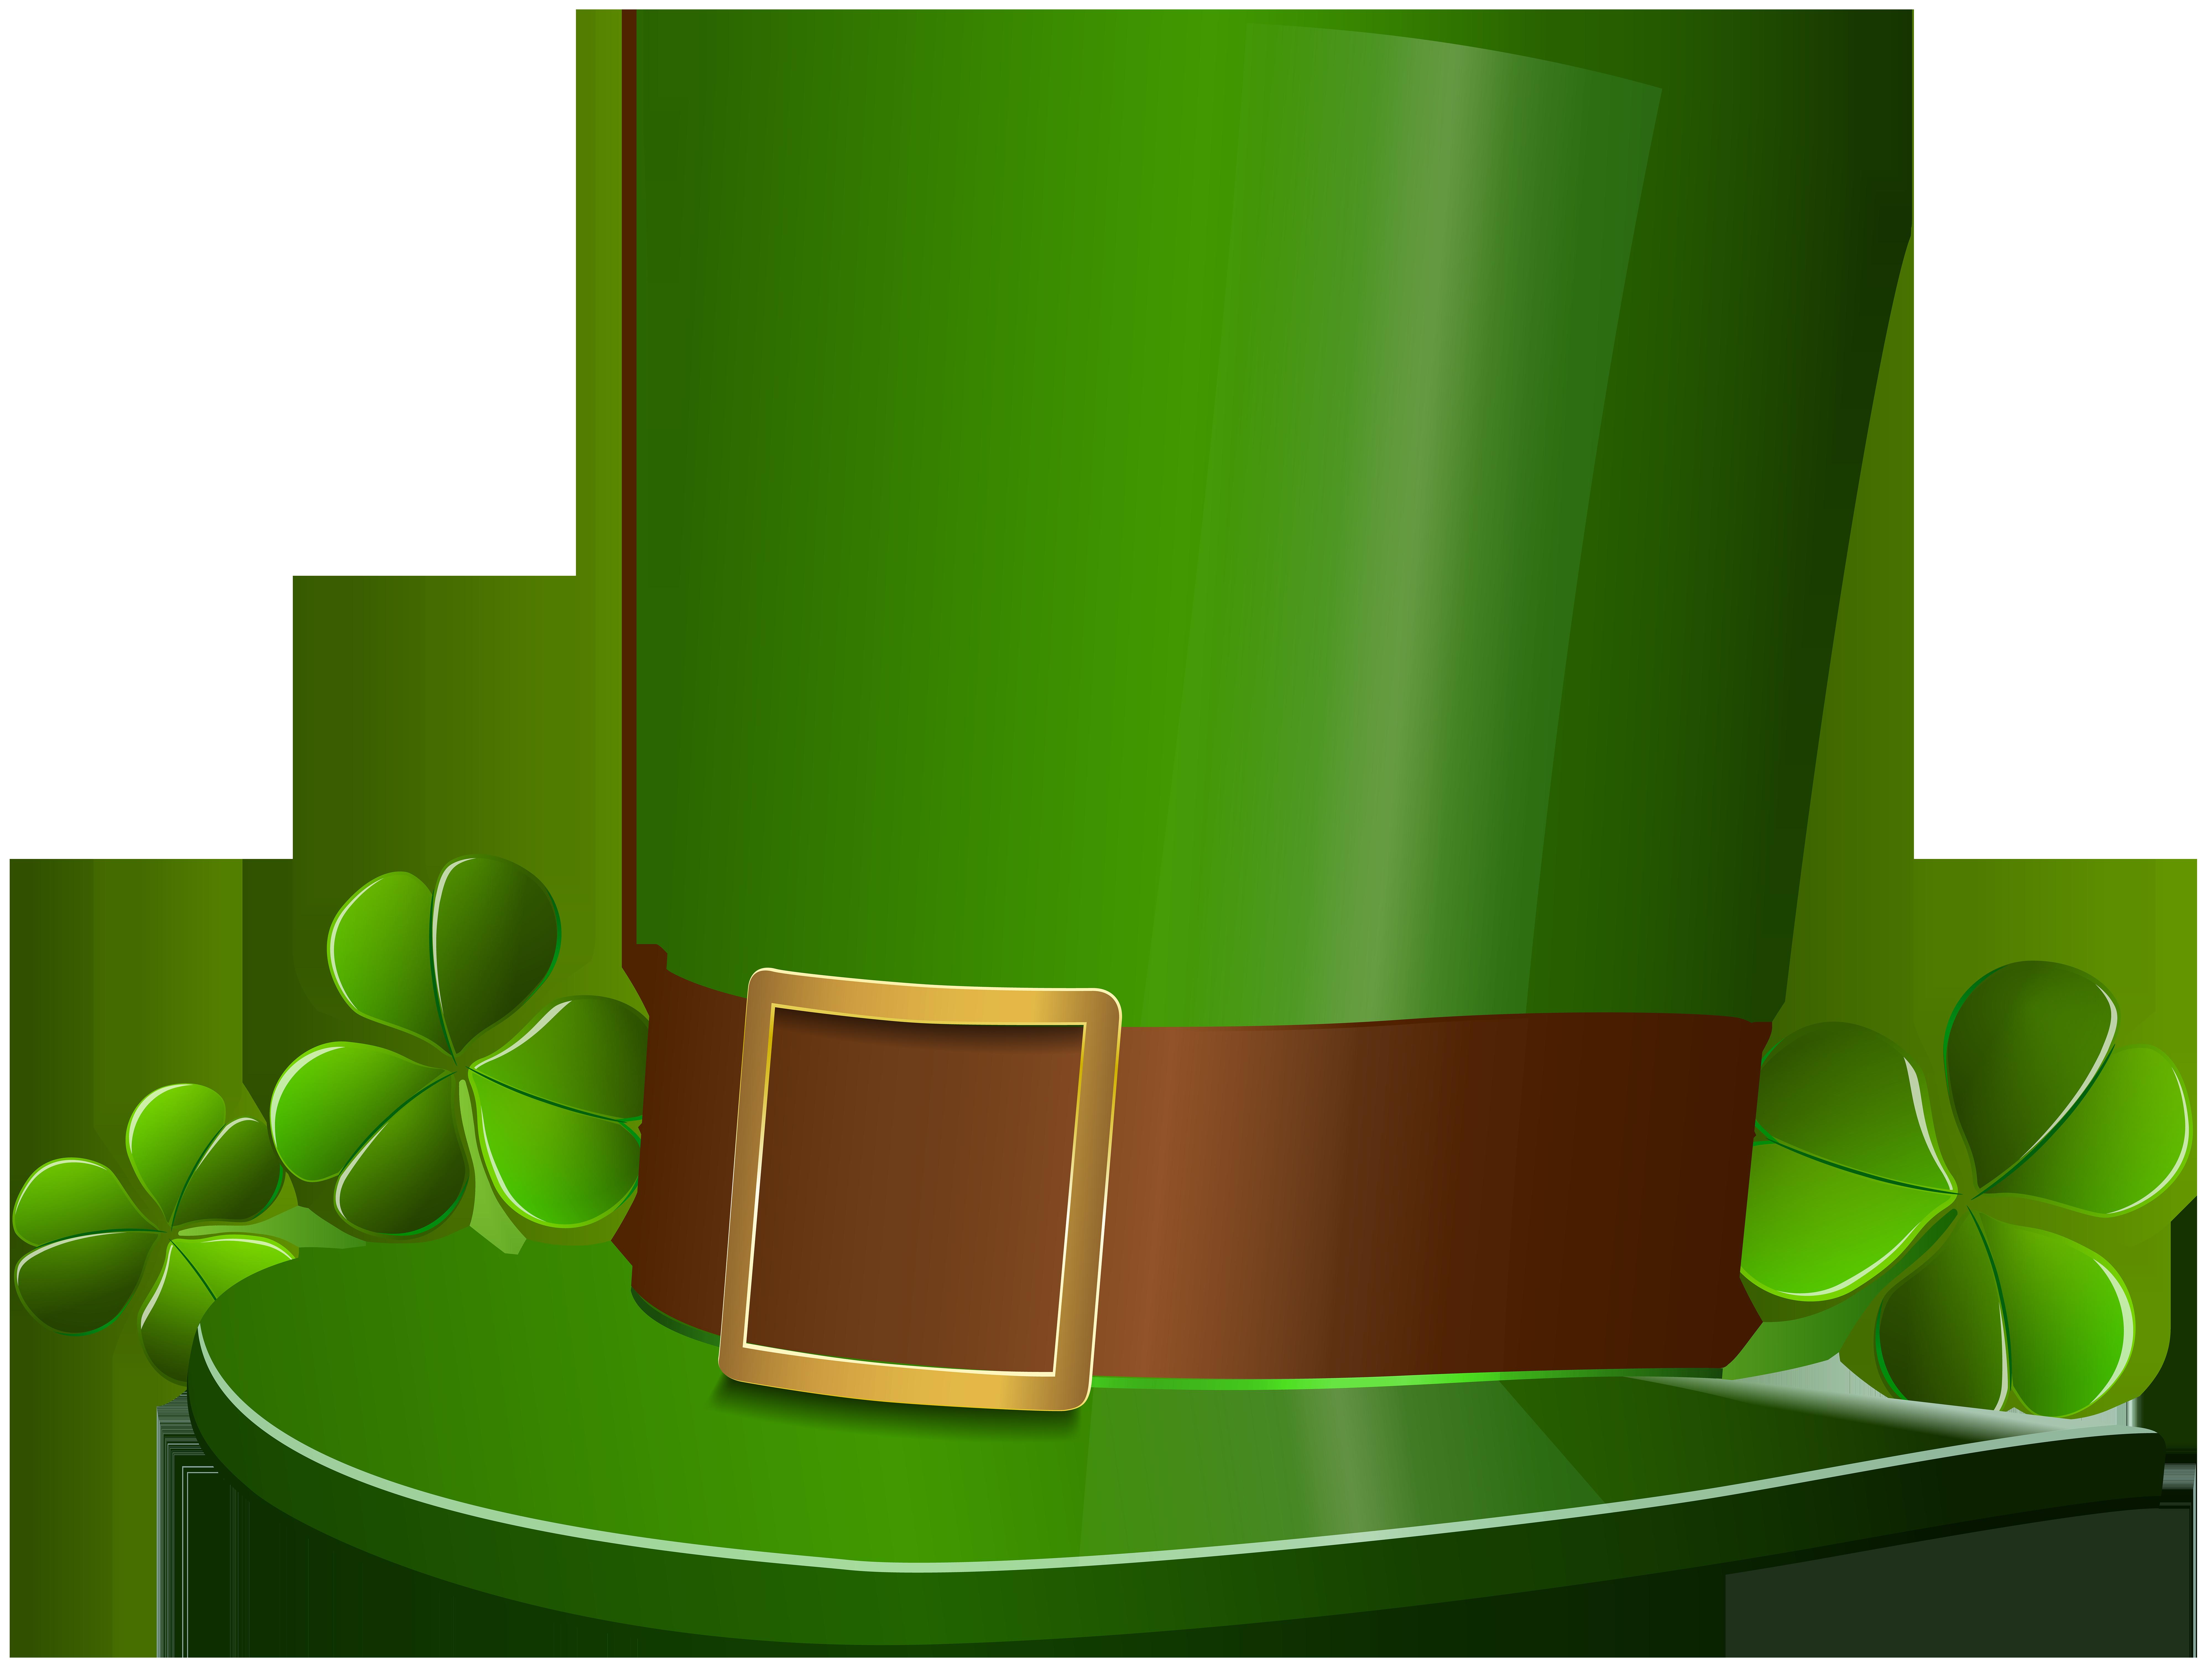 8000x6028 Green Leprechaun Hat Png Clip Art Imageu200b Gallery Yopriceville